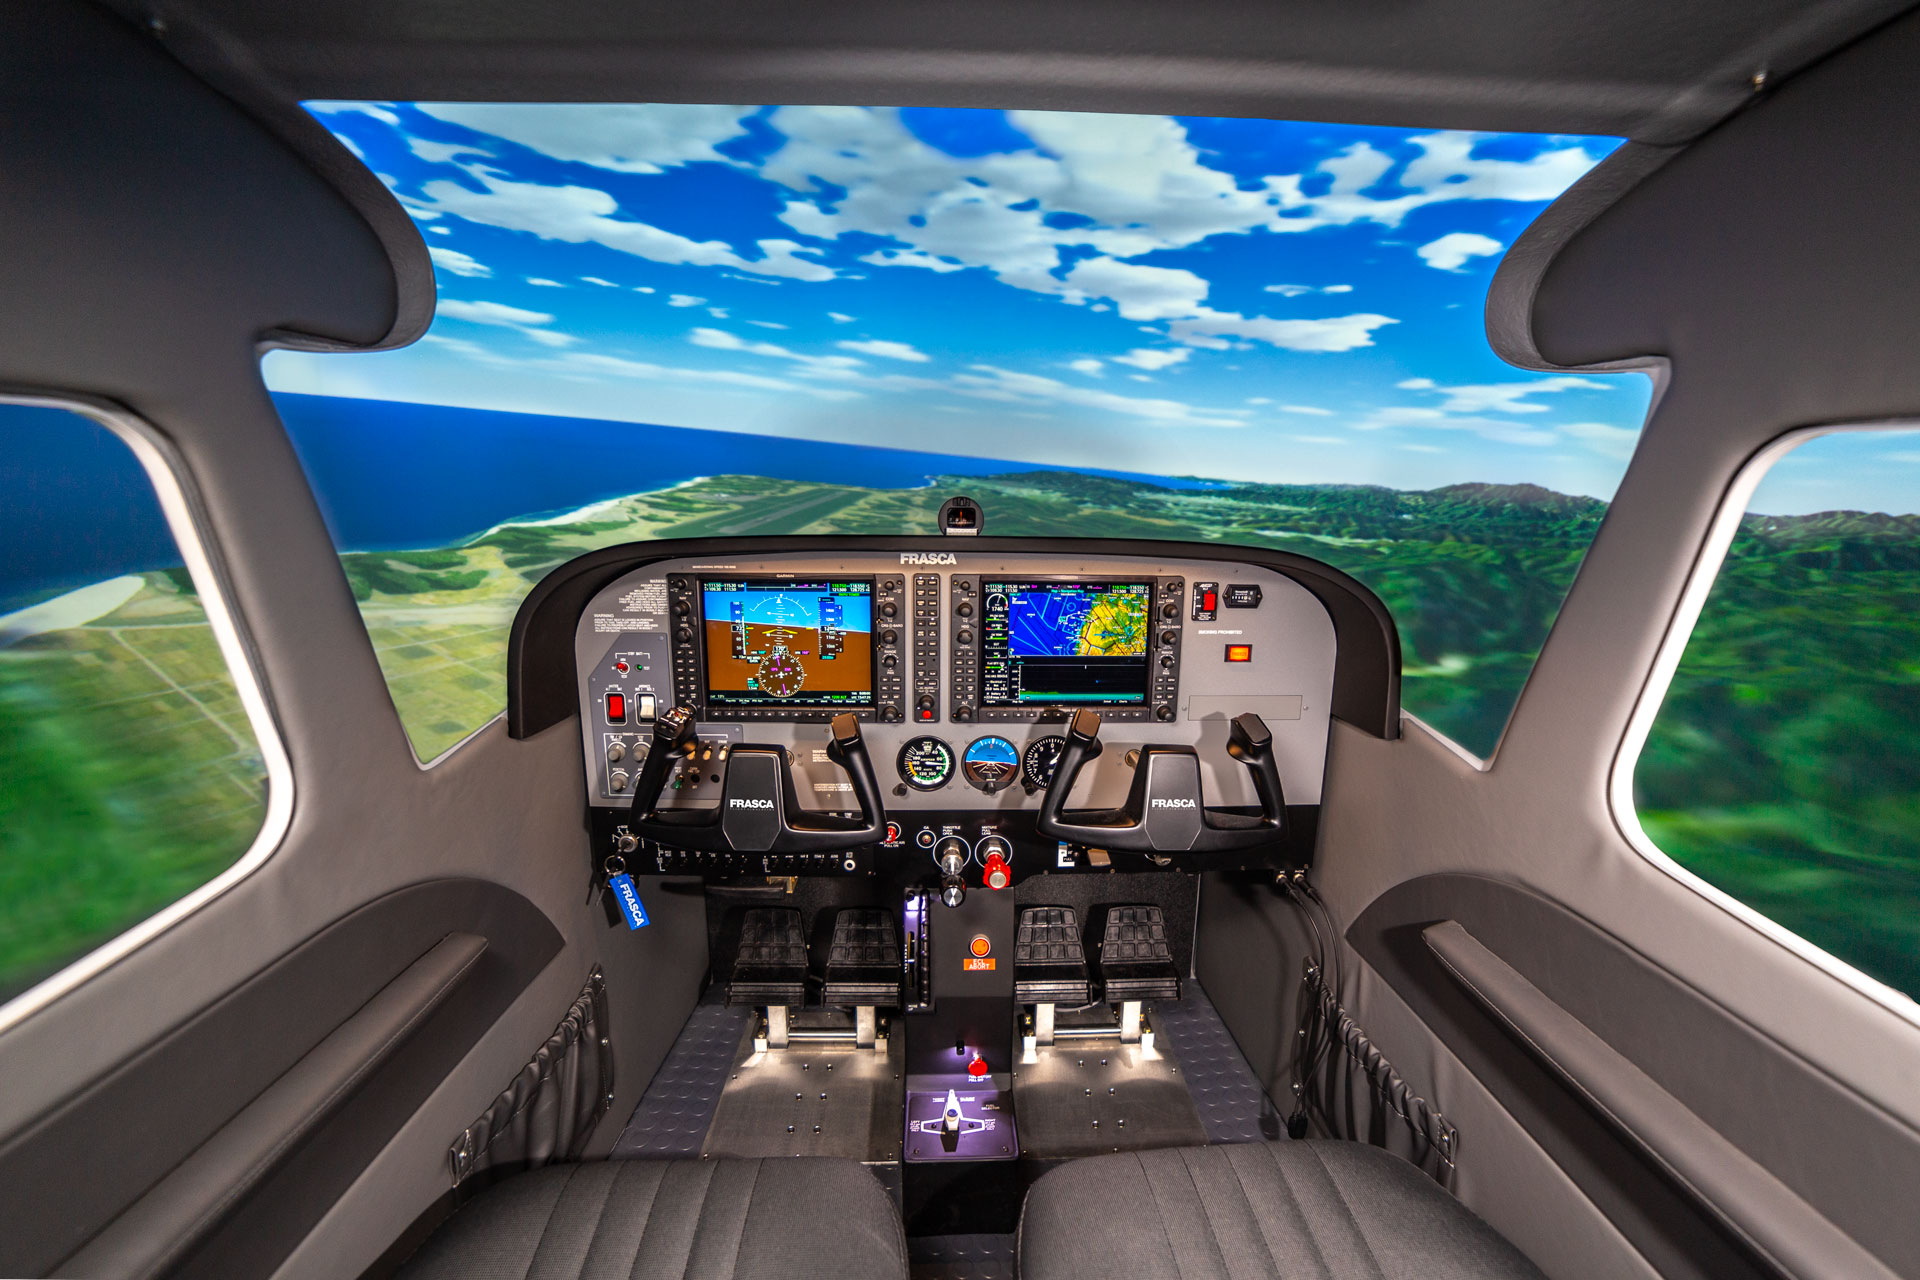 Gambar : Simulasi pesawat terbang